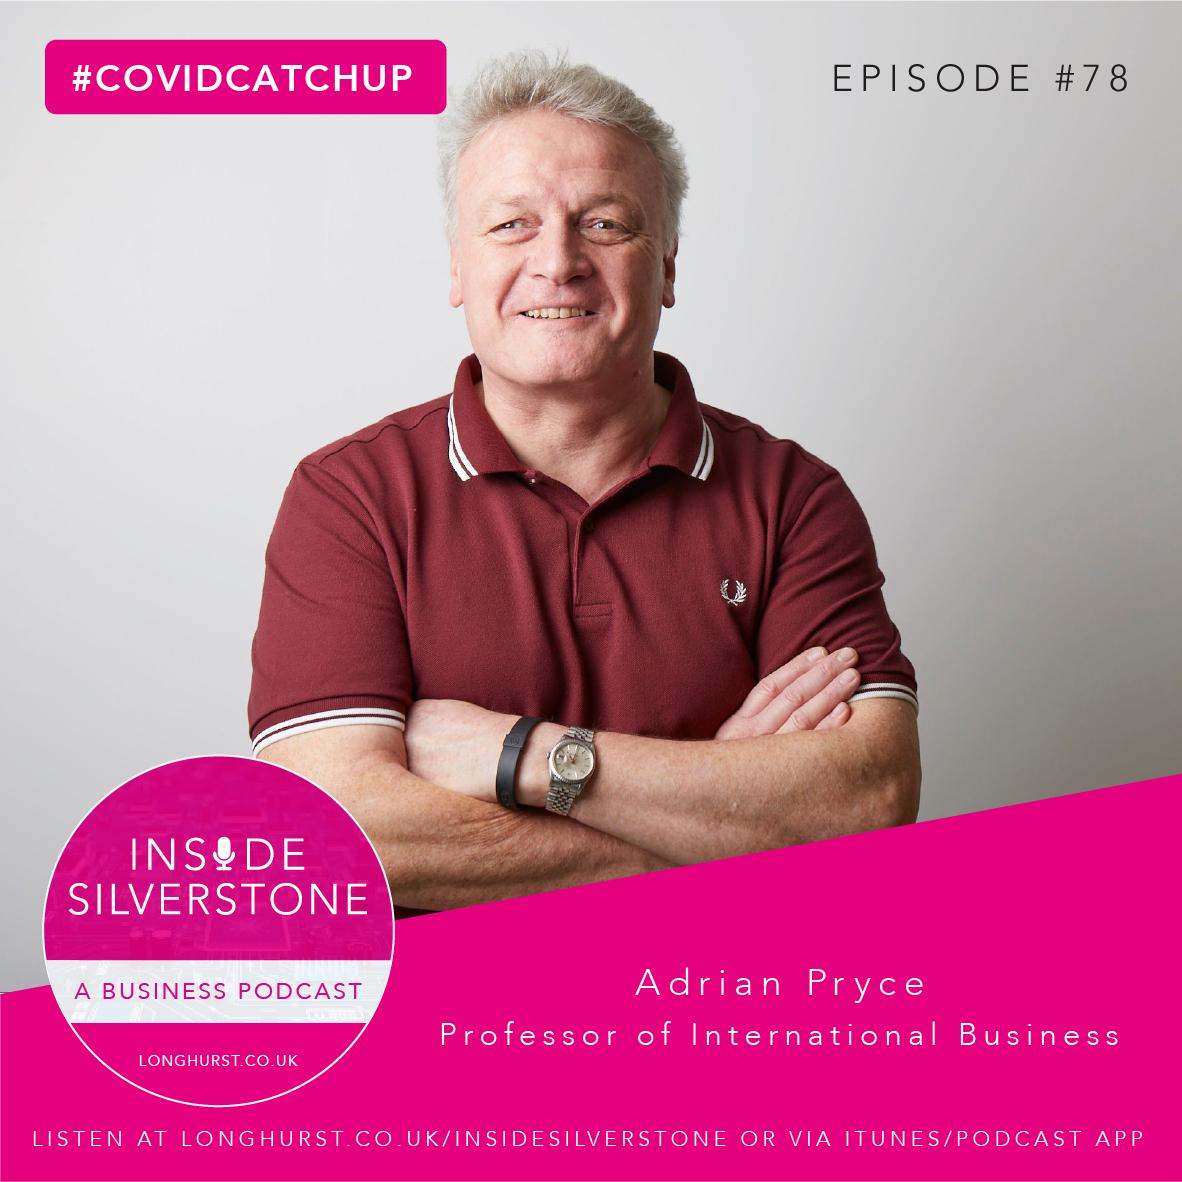 Adrian Pryce - Professor of International Business